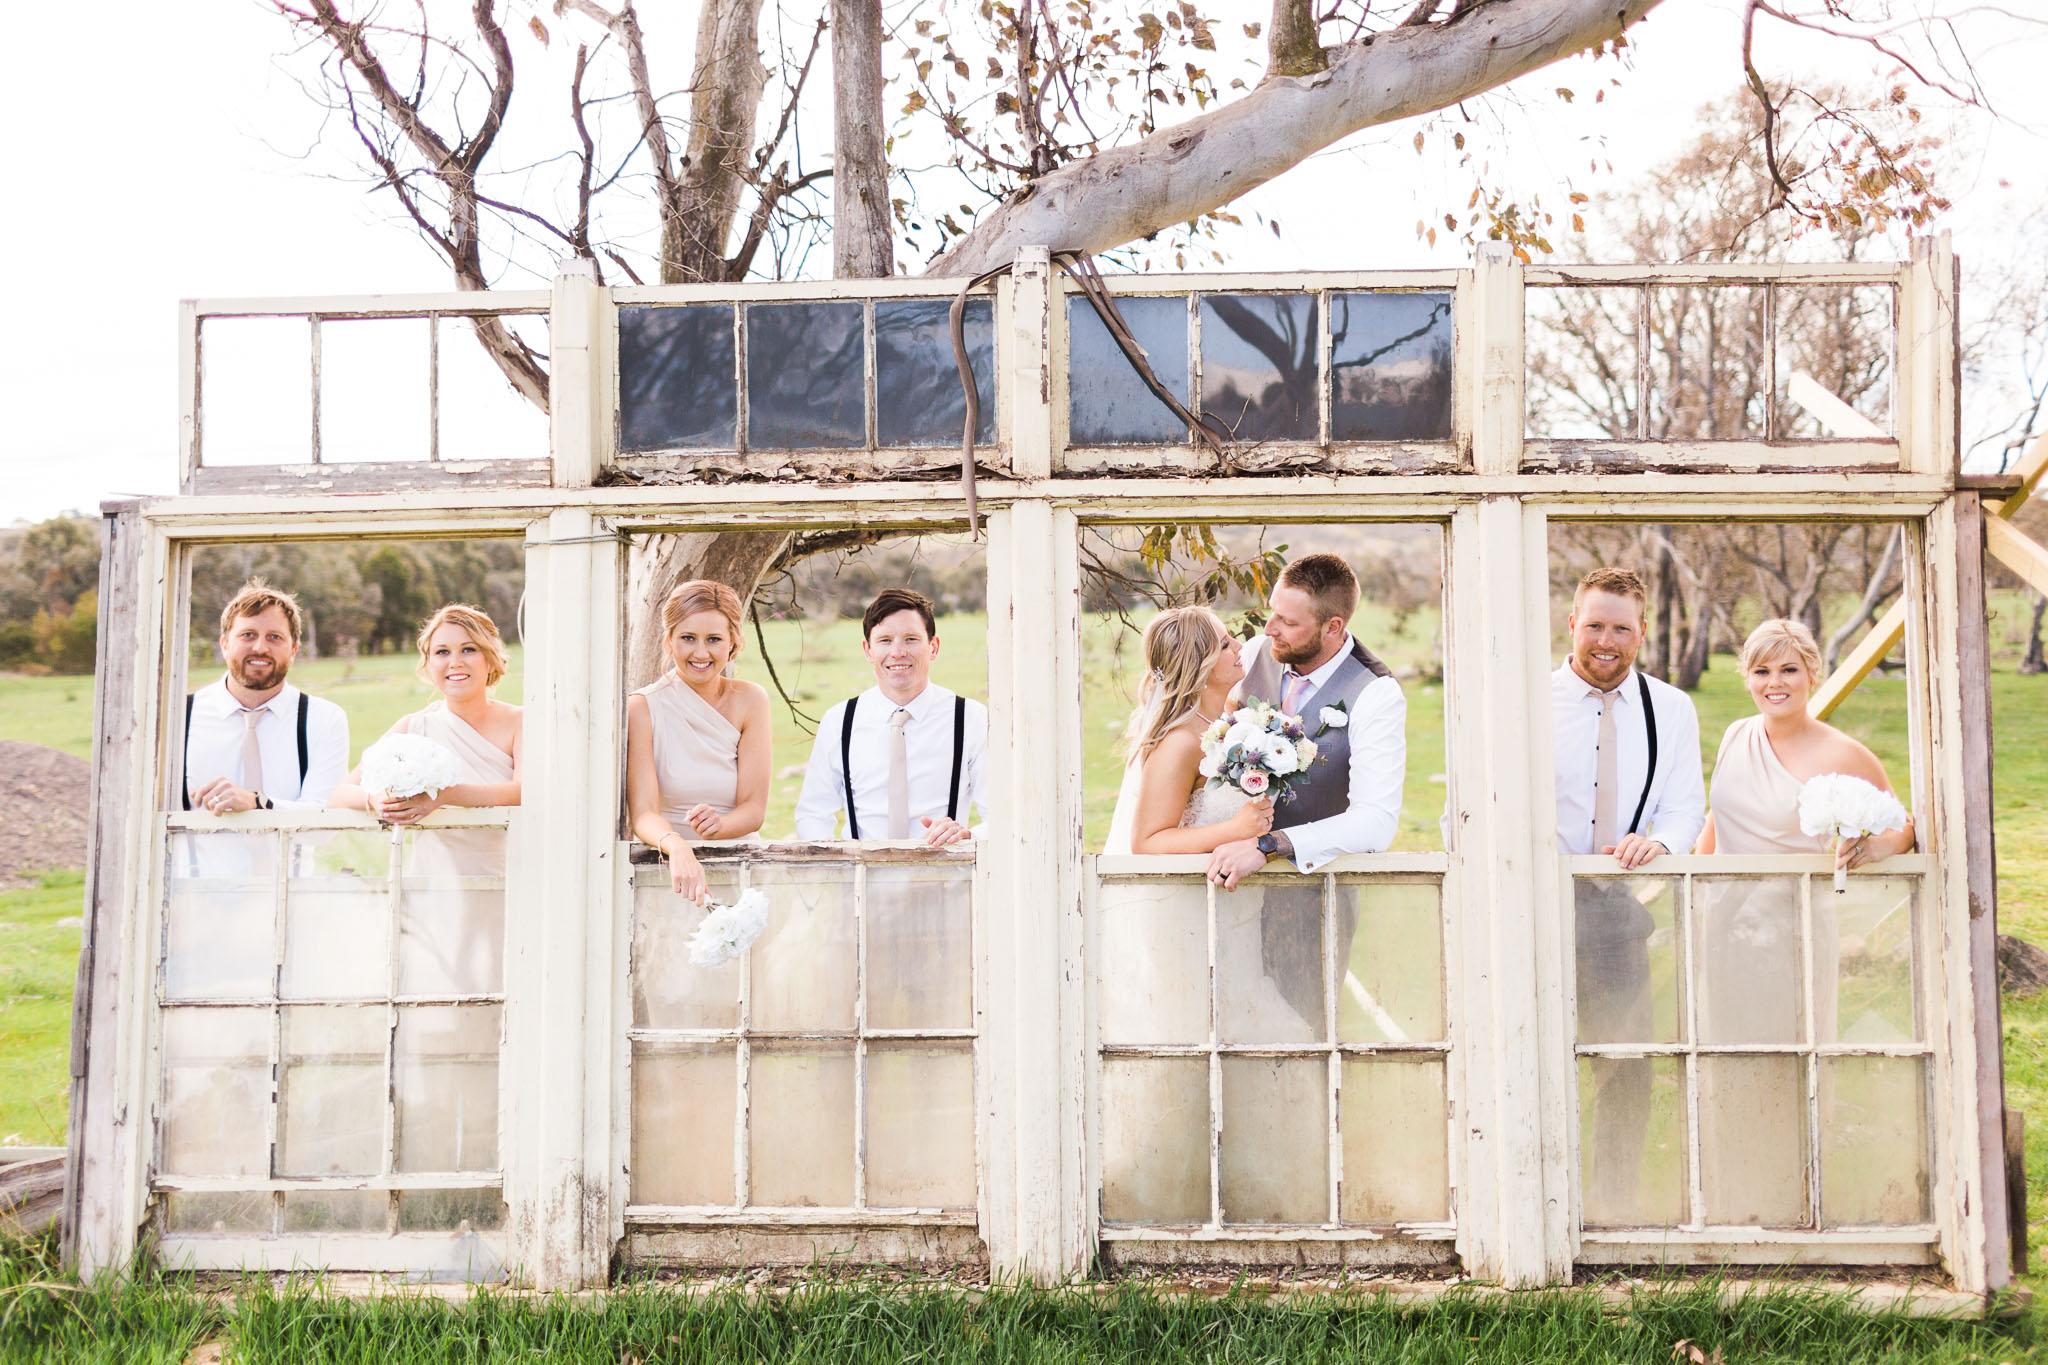 Old Window Frames - Gold Creek Station Wedding Photography